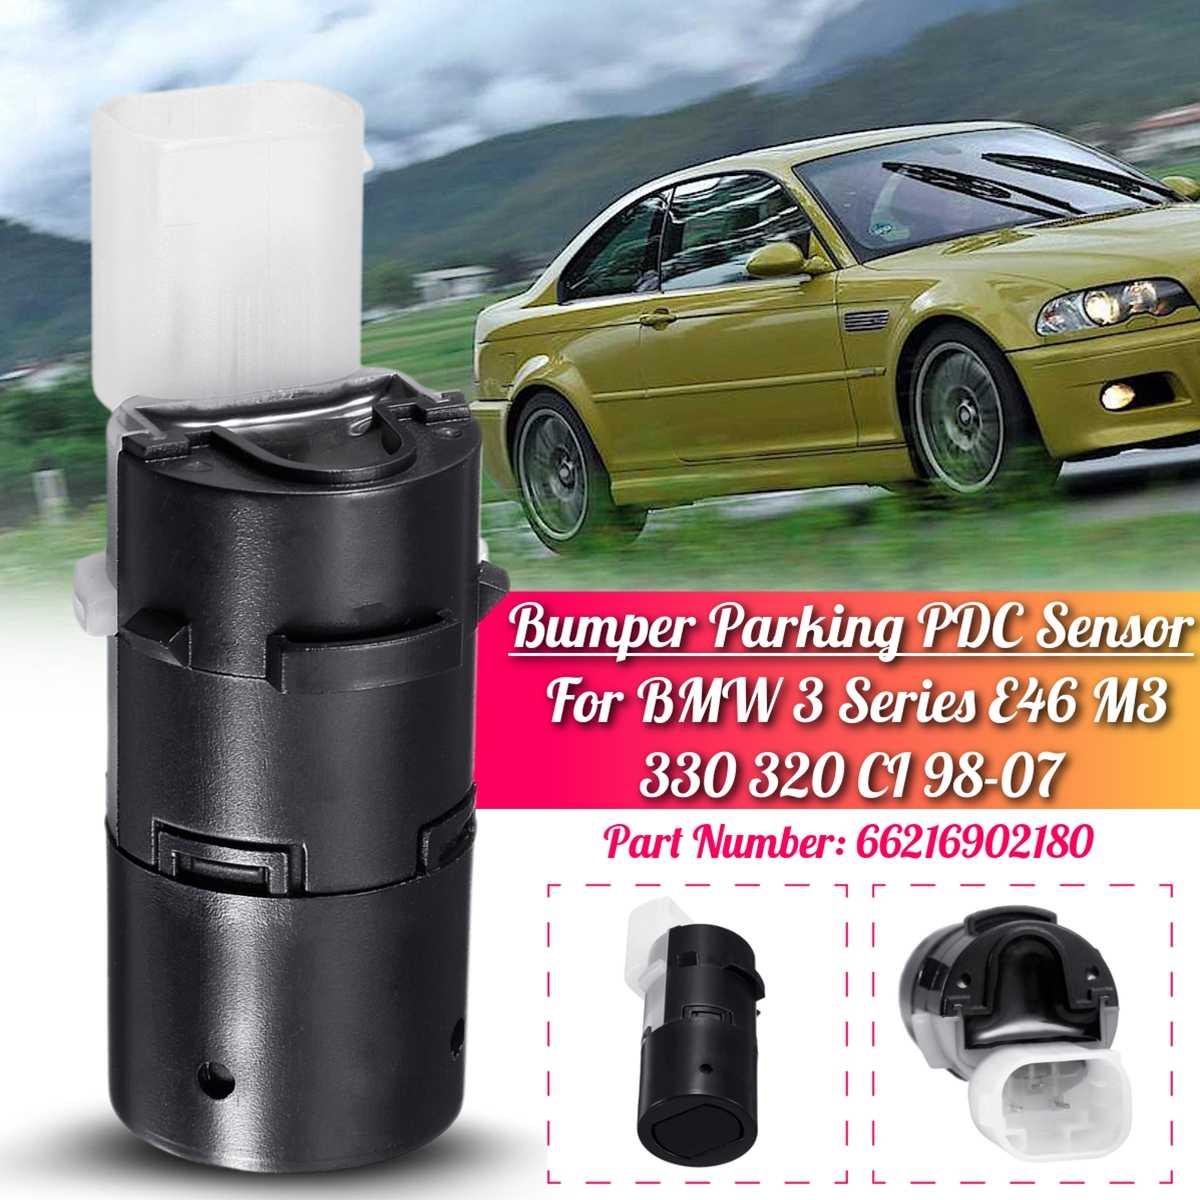 Car Front//Rear PDC Paring Sensor for BMW 3 Series E46 1998-2007 66216902180